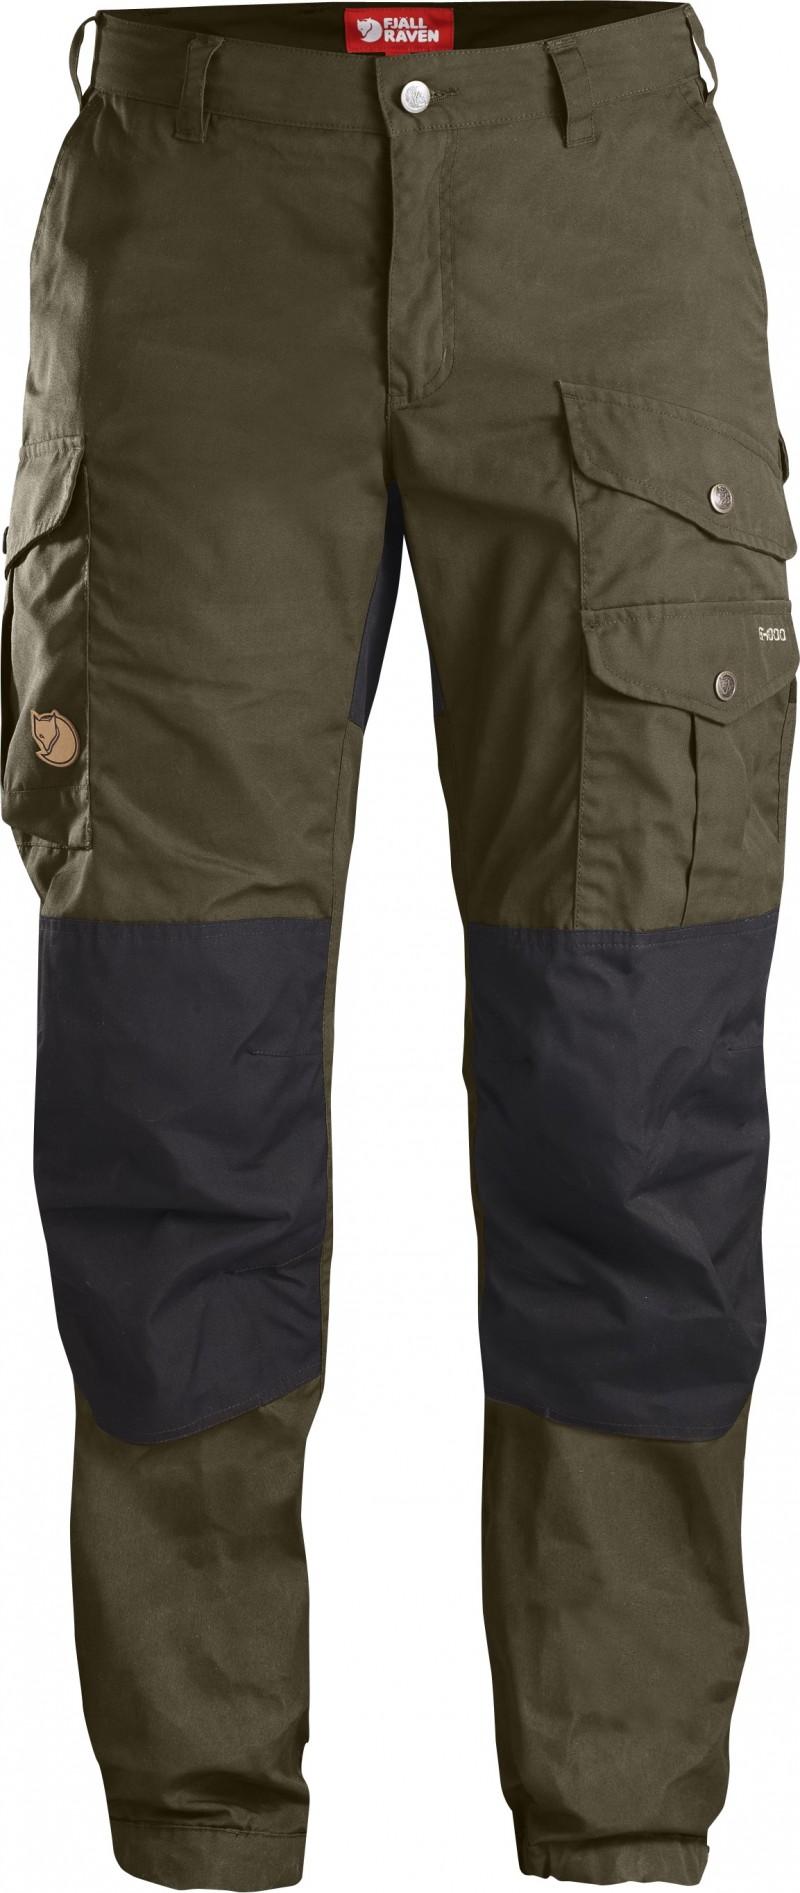 FjallRaven Vidda Pro Hydr.Trousers W. Dark Olive-30